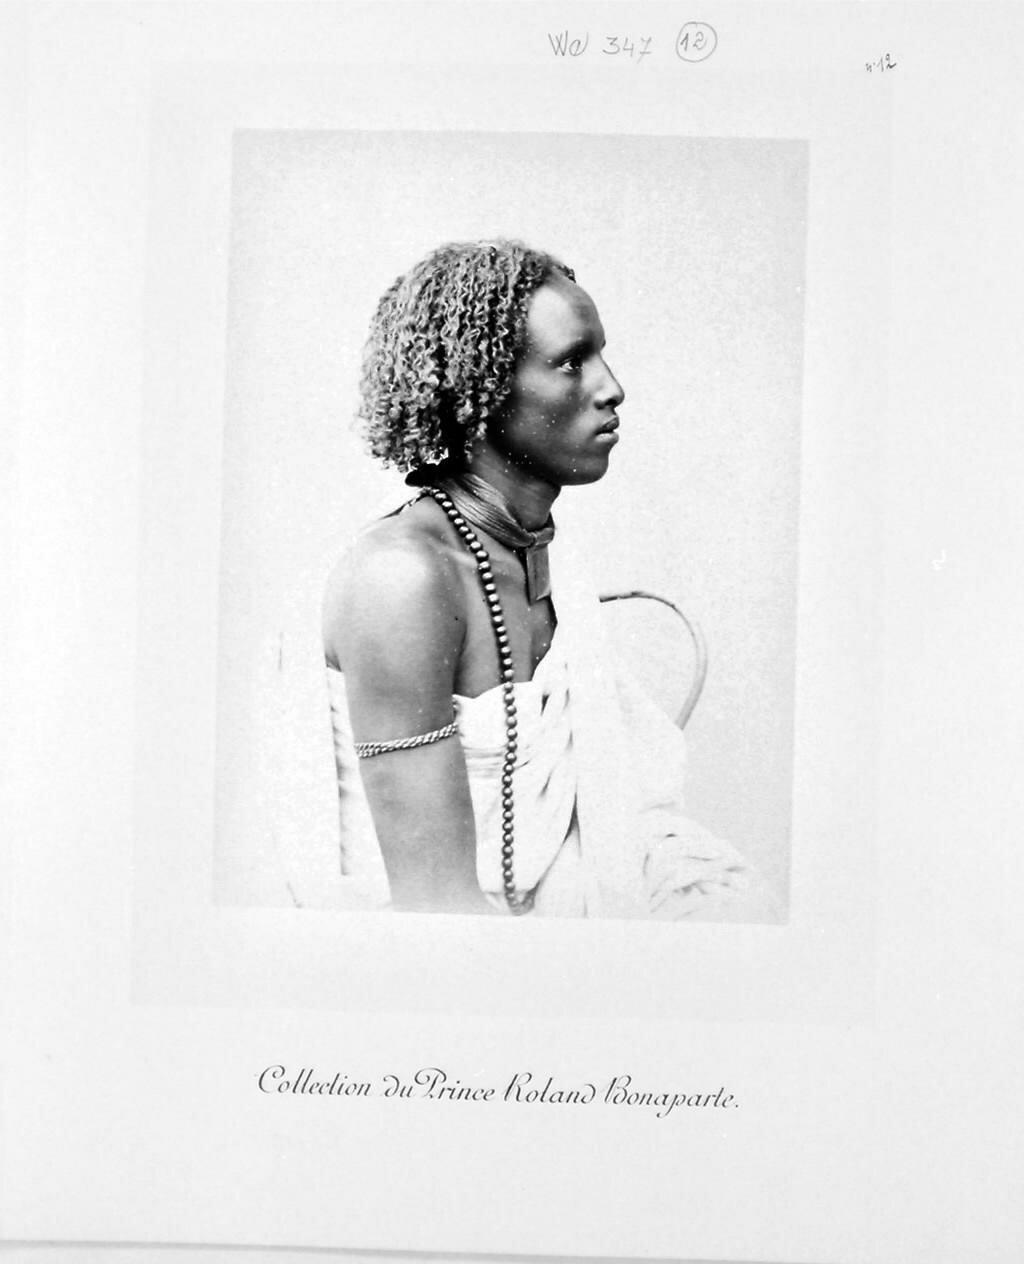 Эгге Чербааче, племя Хабар-аваль, 21 год